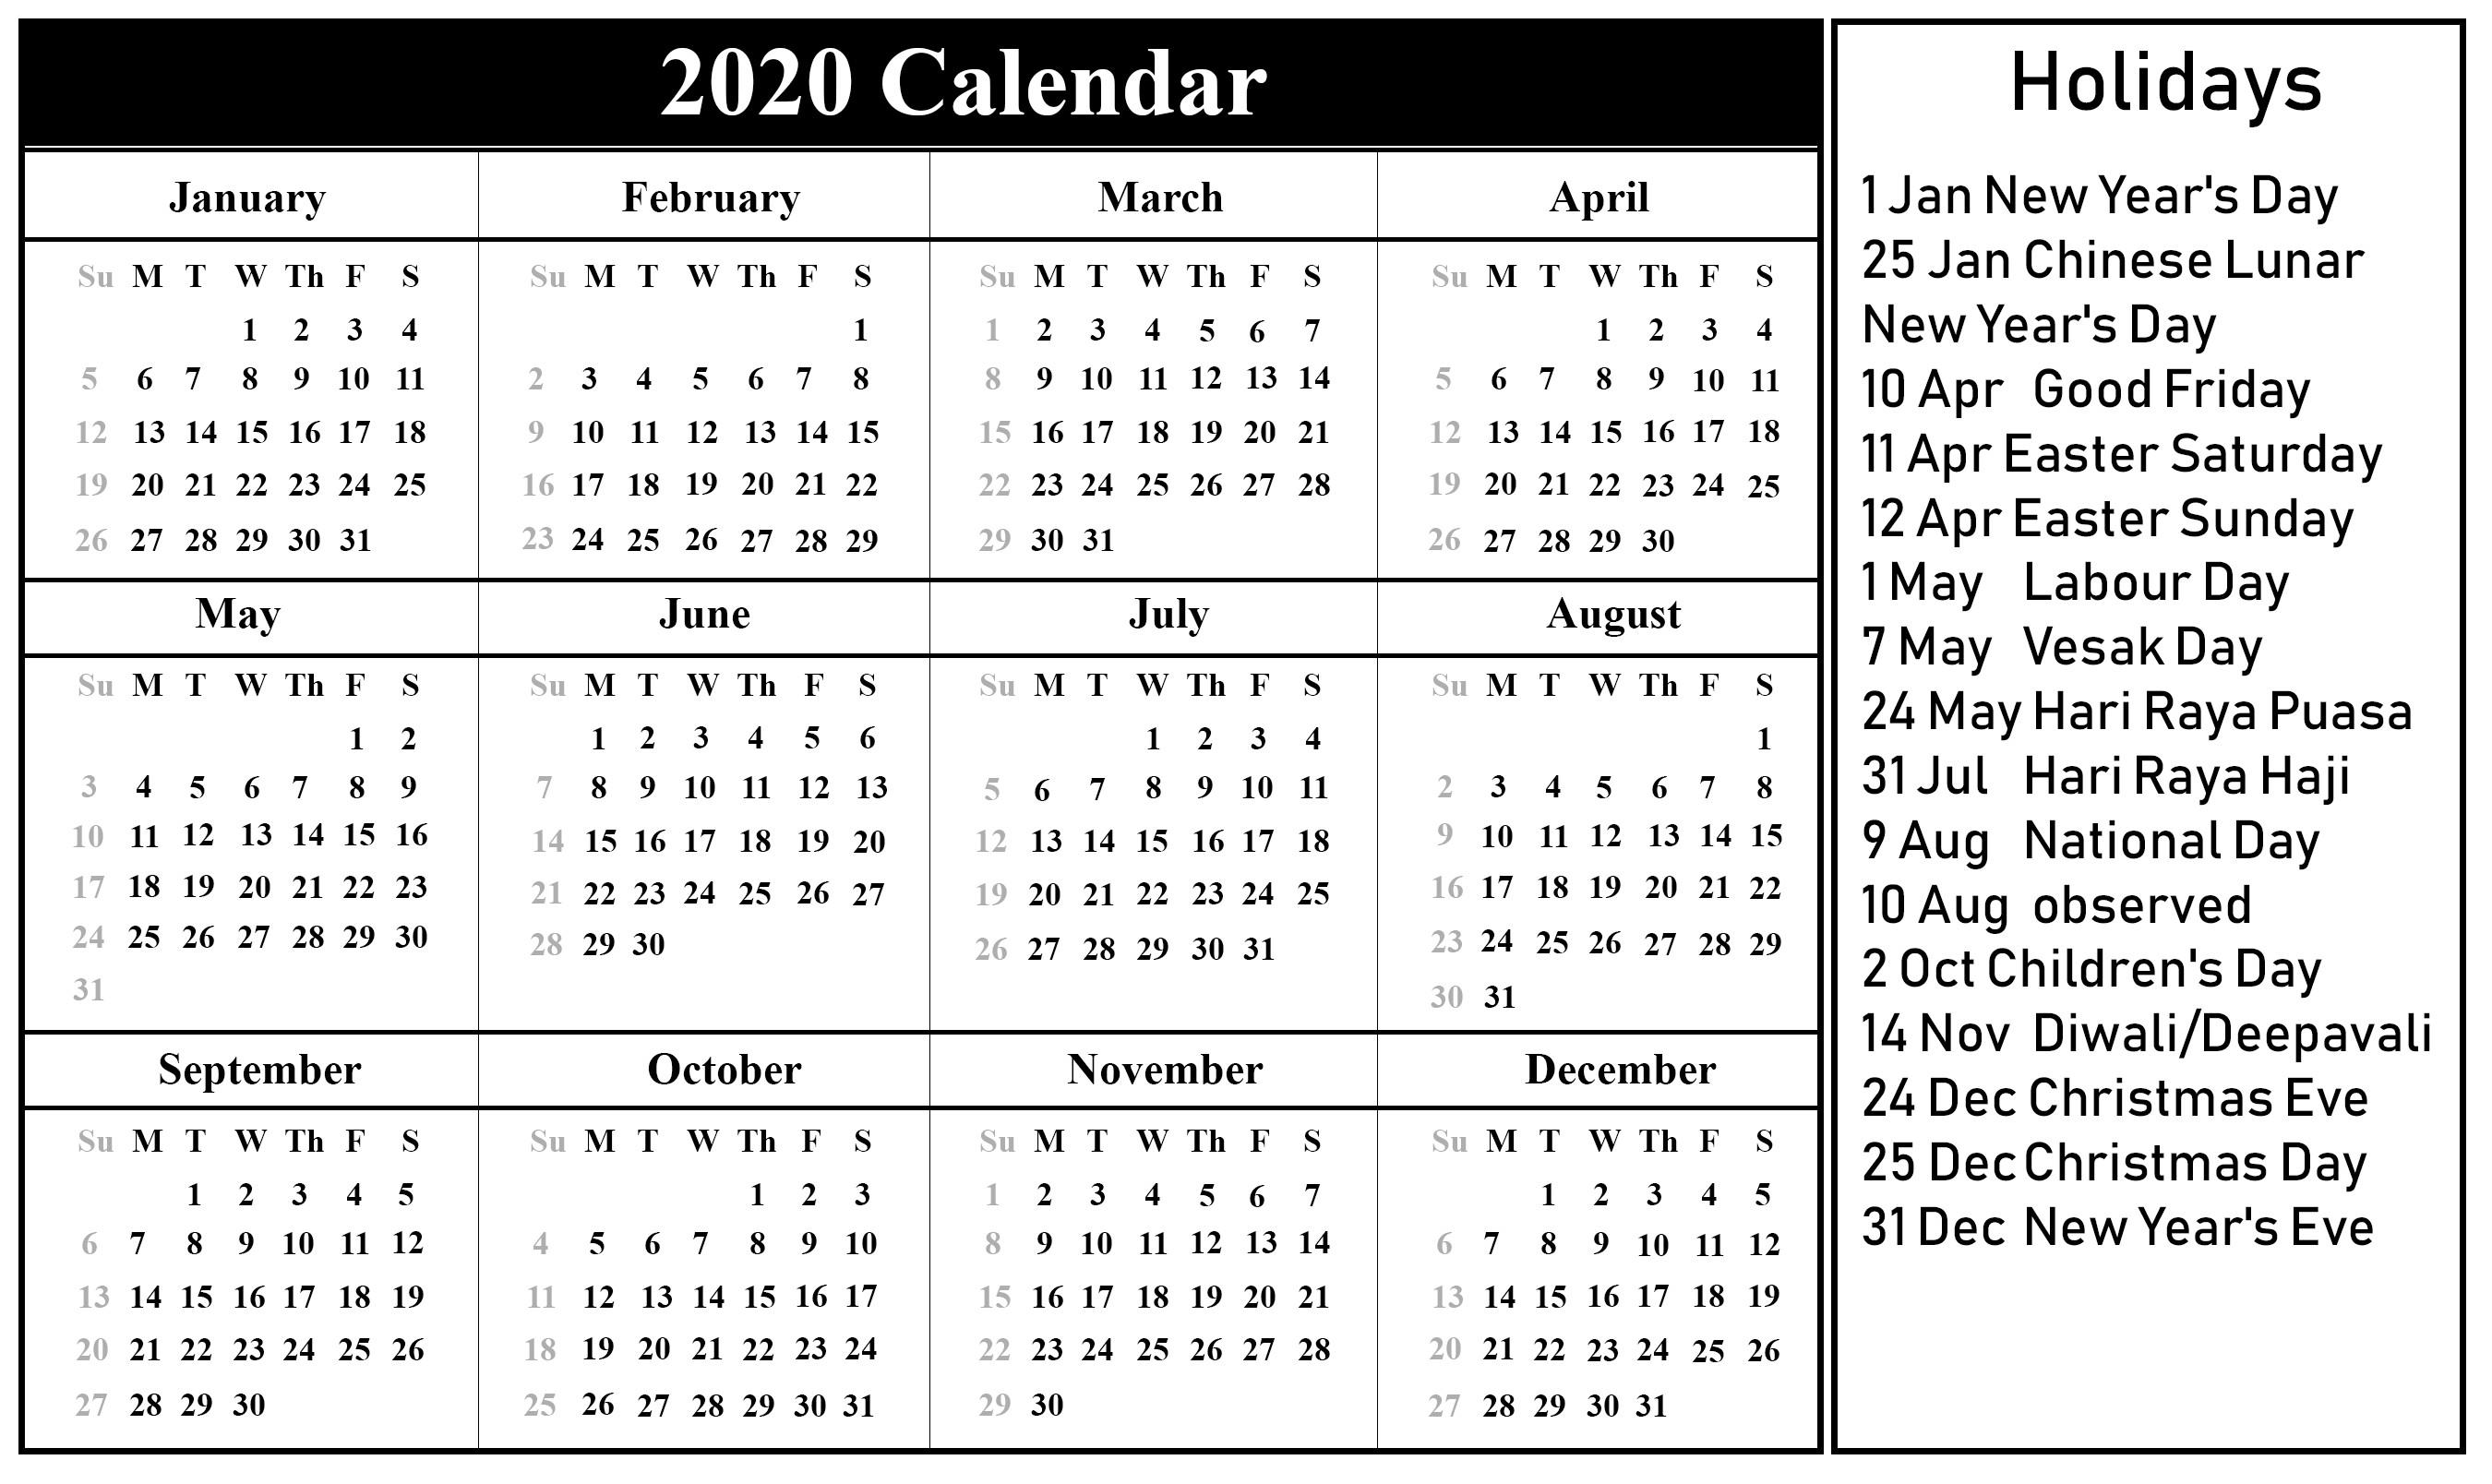 Printable 2020 Calendar Free Download Singapore 2020 Calendar Pdf & Excel & Word